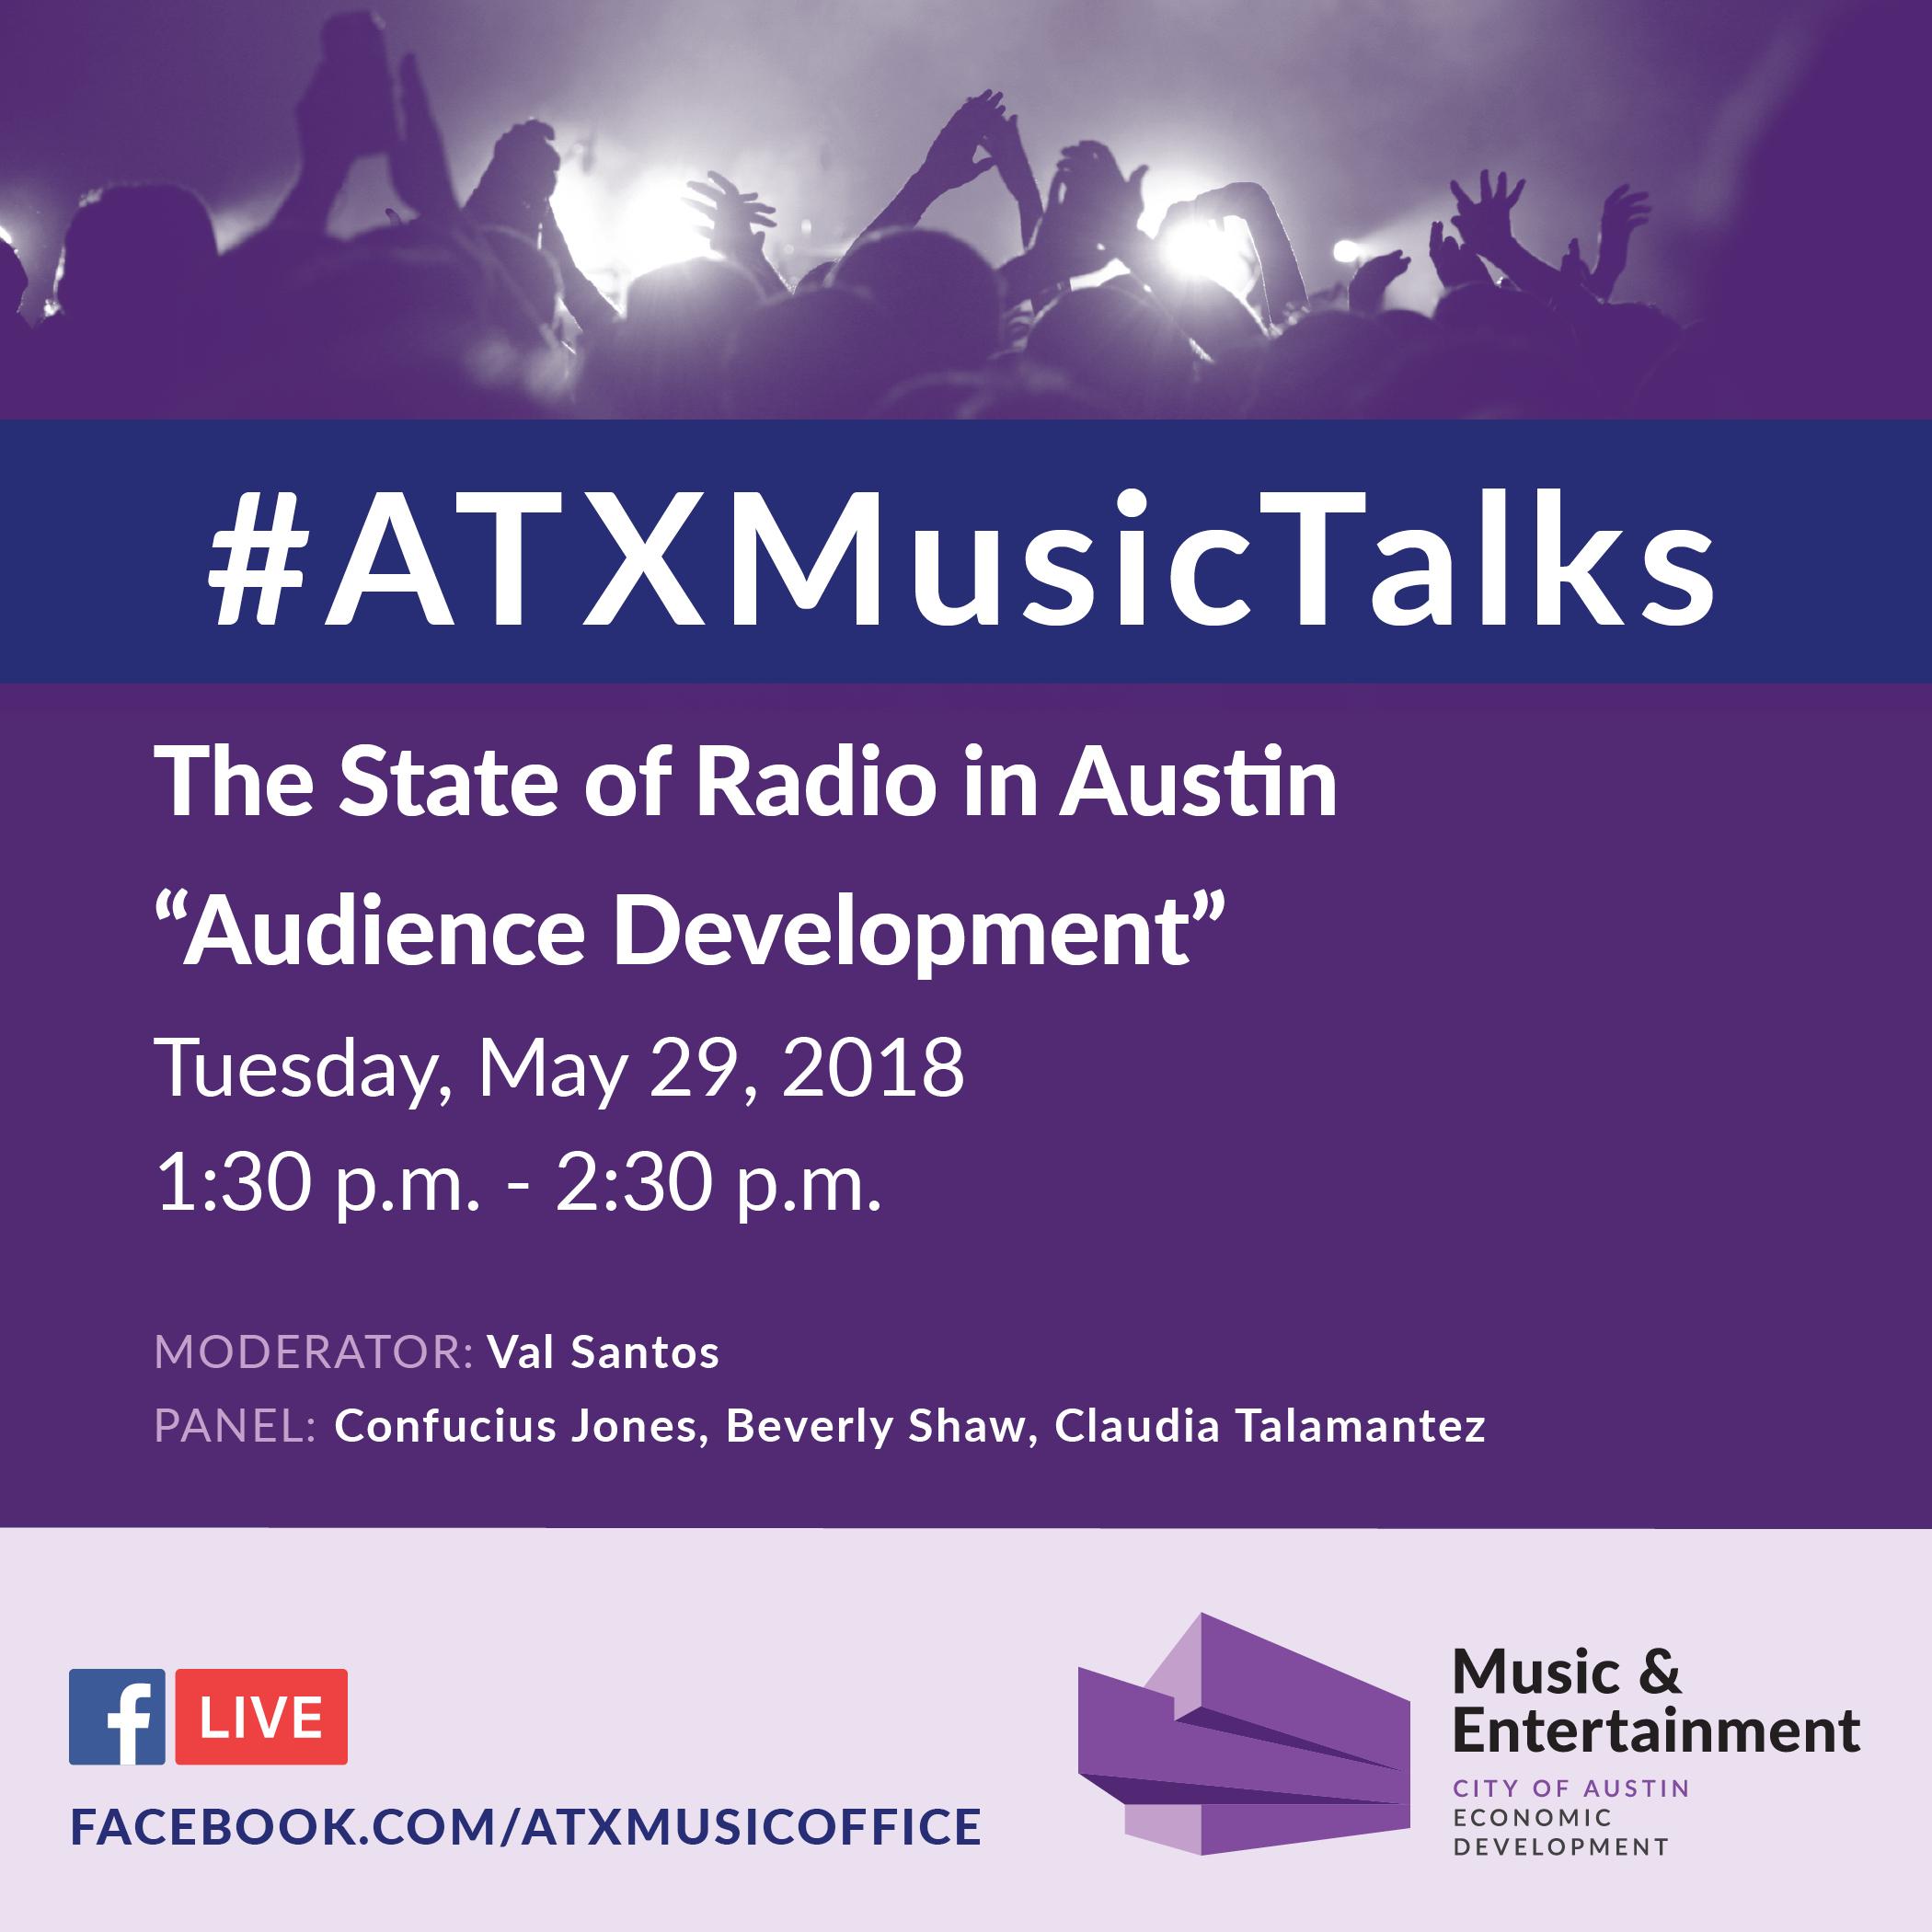 ATX music event invitation image